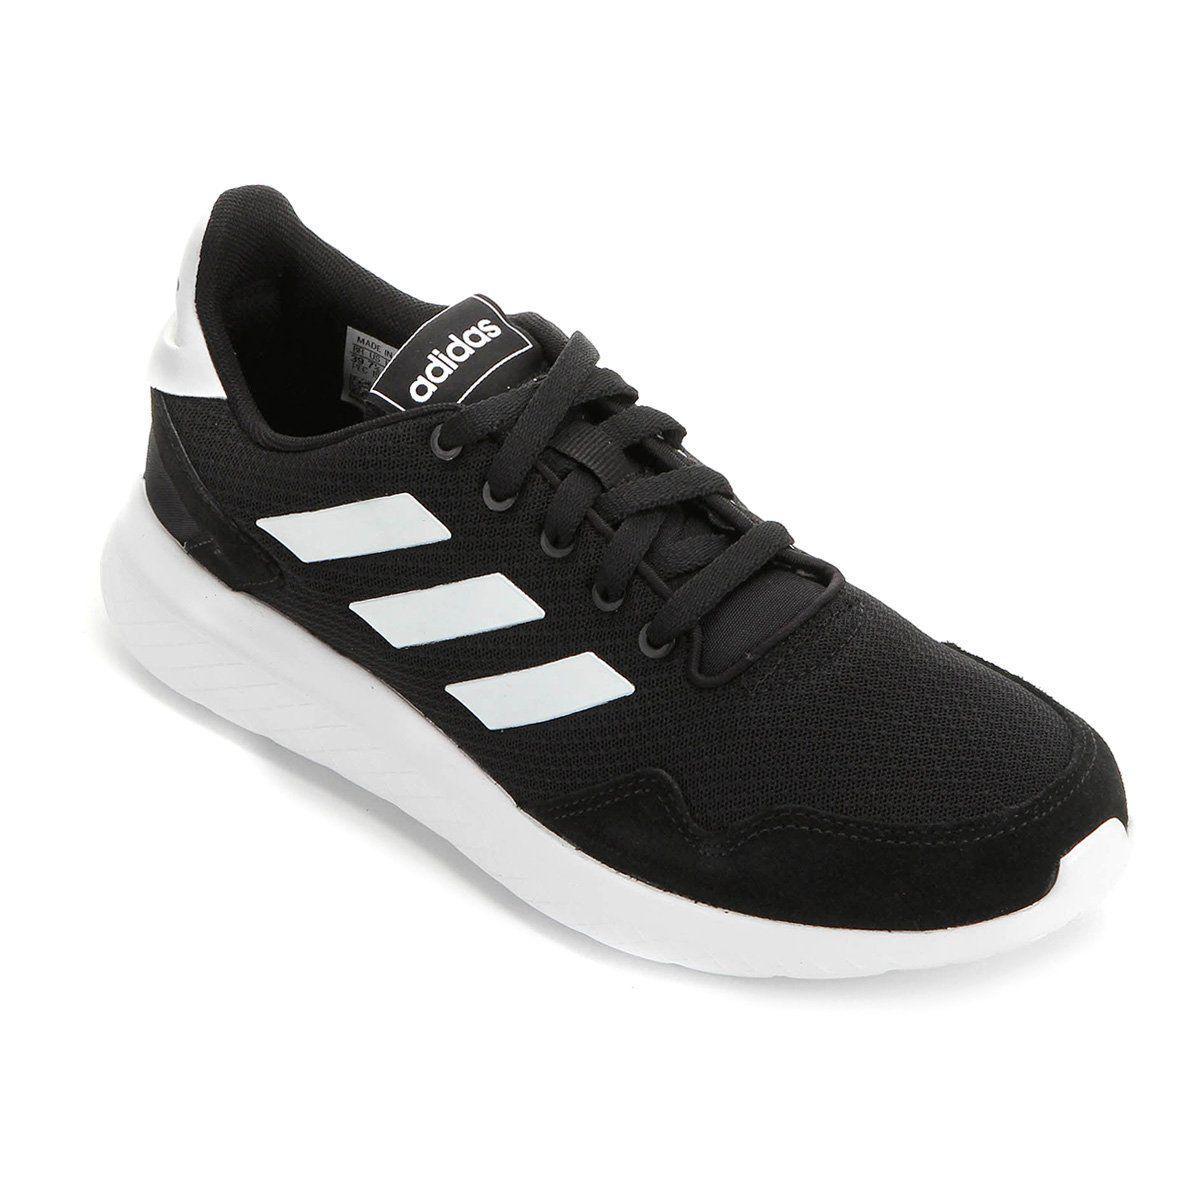 Tênis Adidas Wish Archivo Masculino